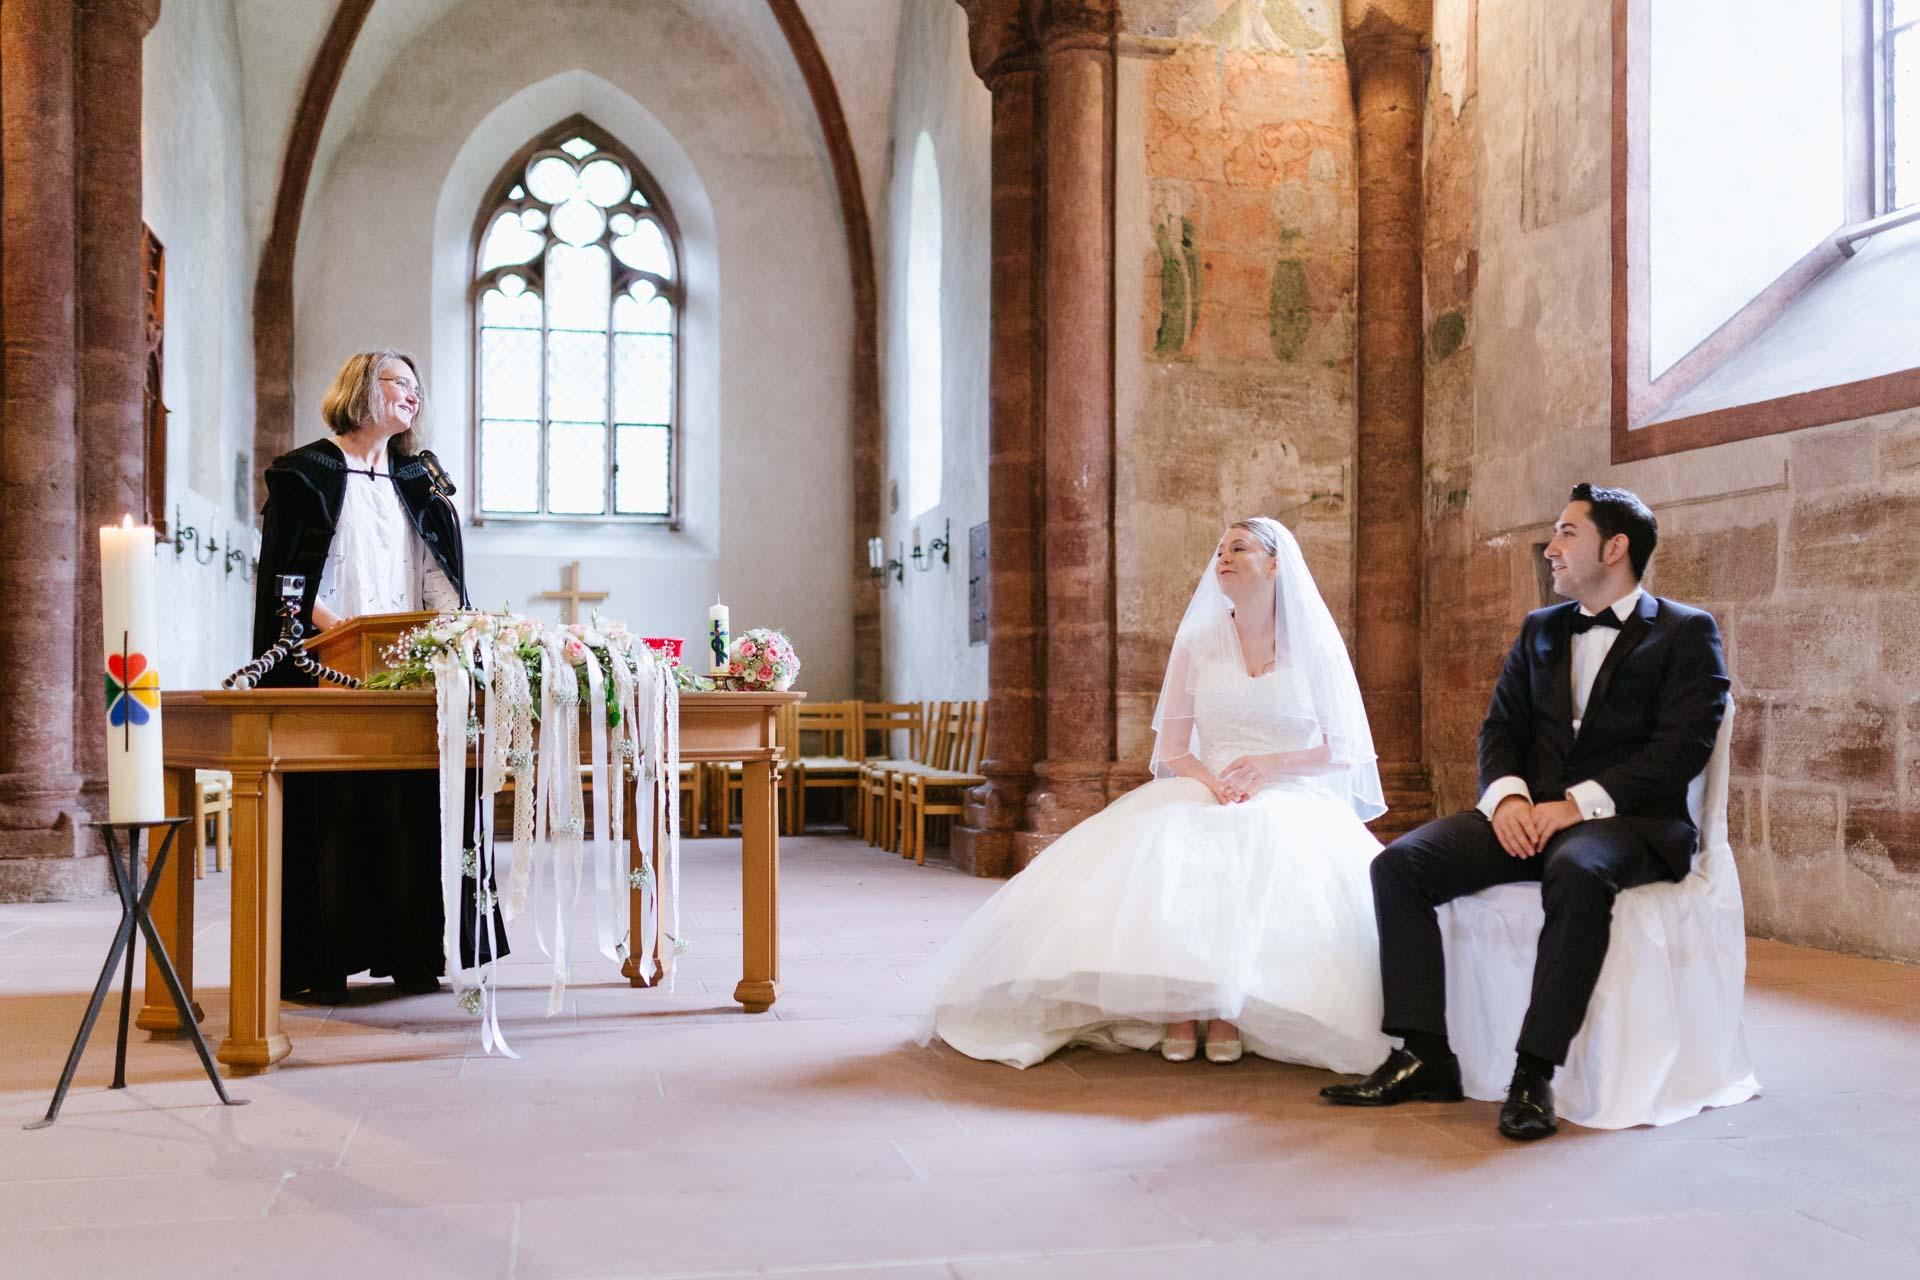 Dana_Michael_Hochzeit_Muttenz_2016-16